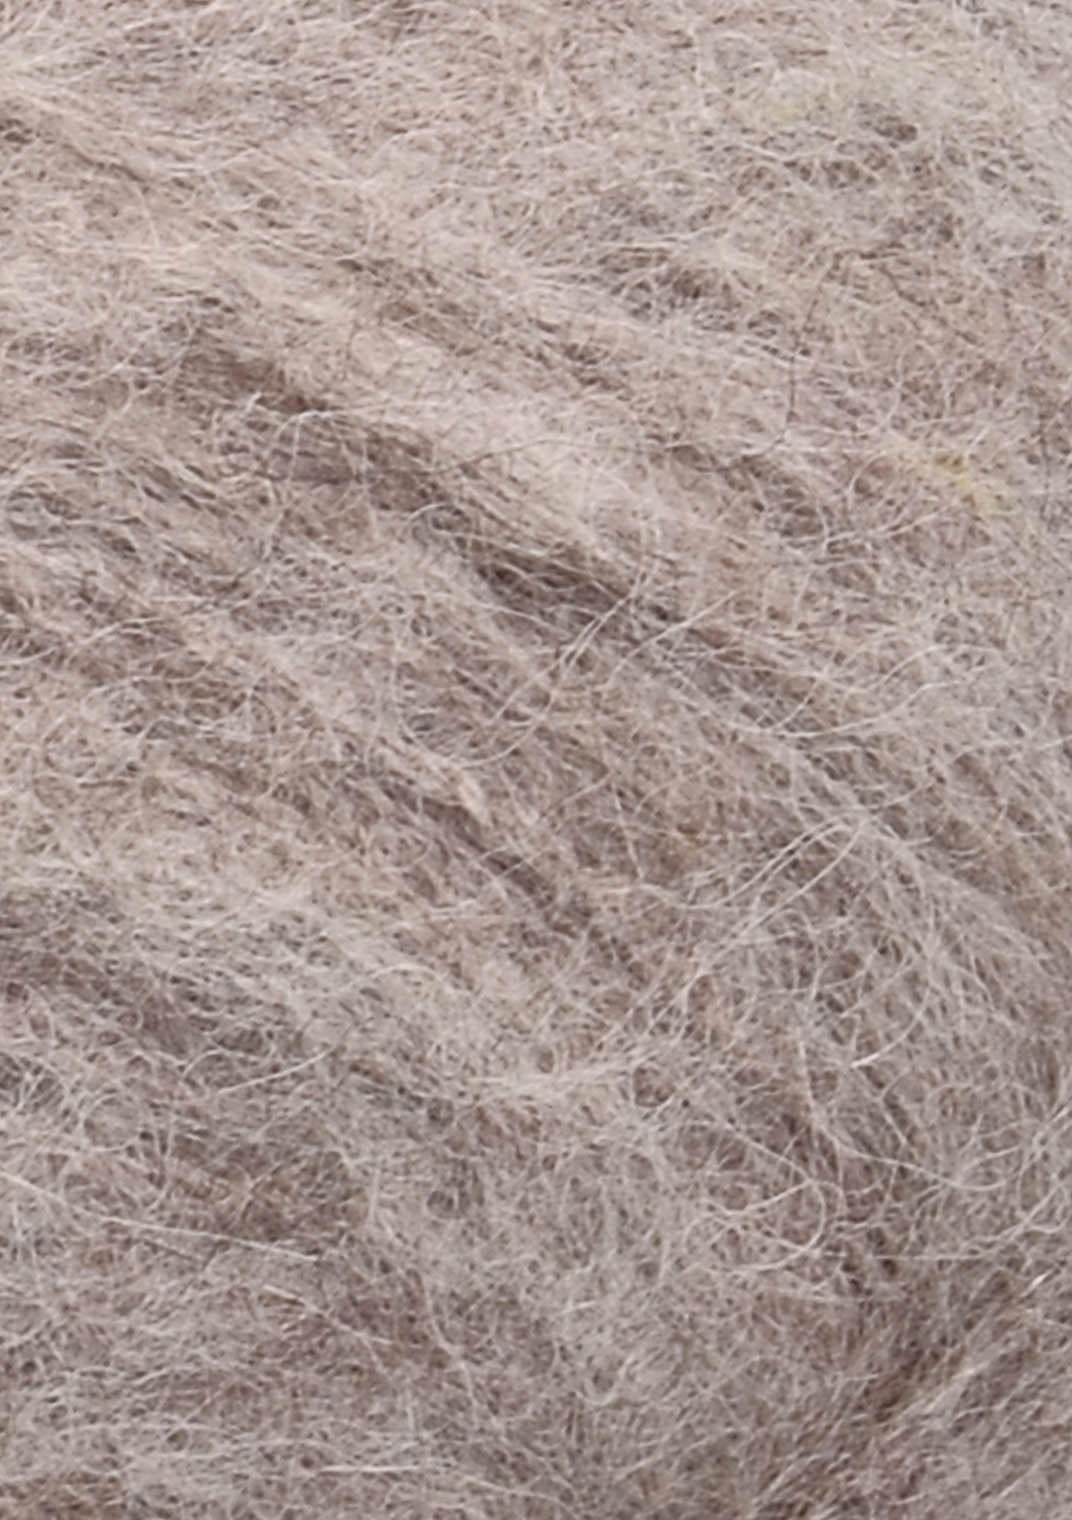 2650 Bigemeleret Børstet Alpakka